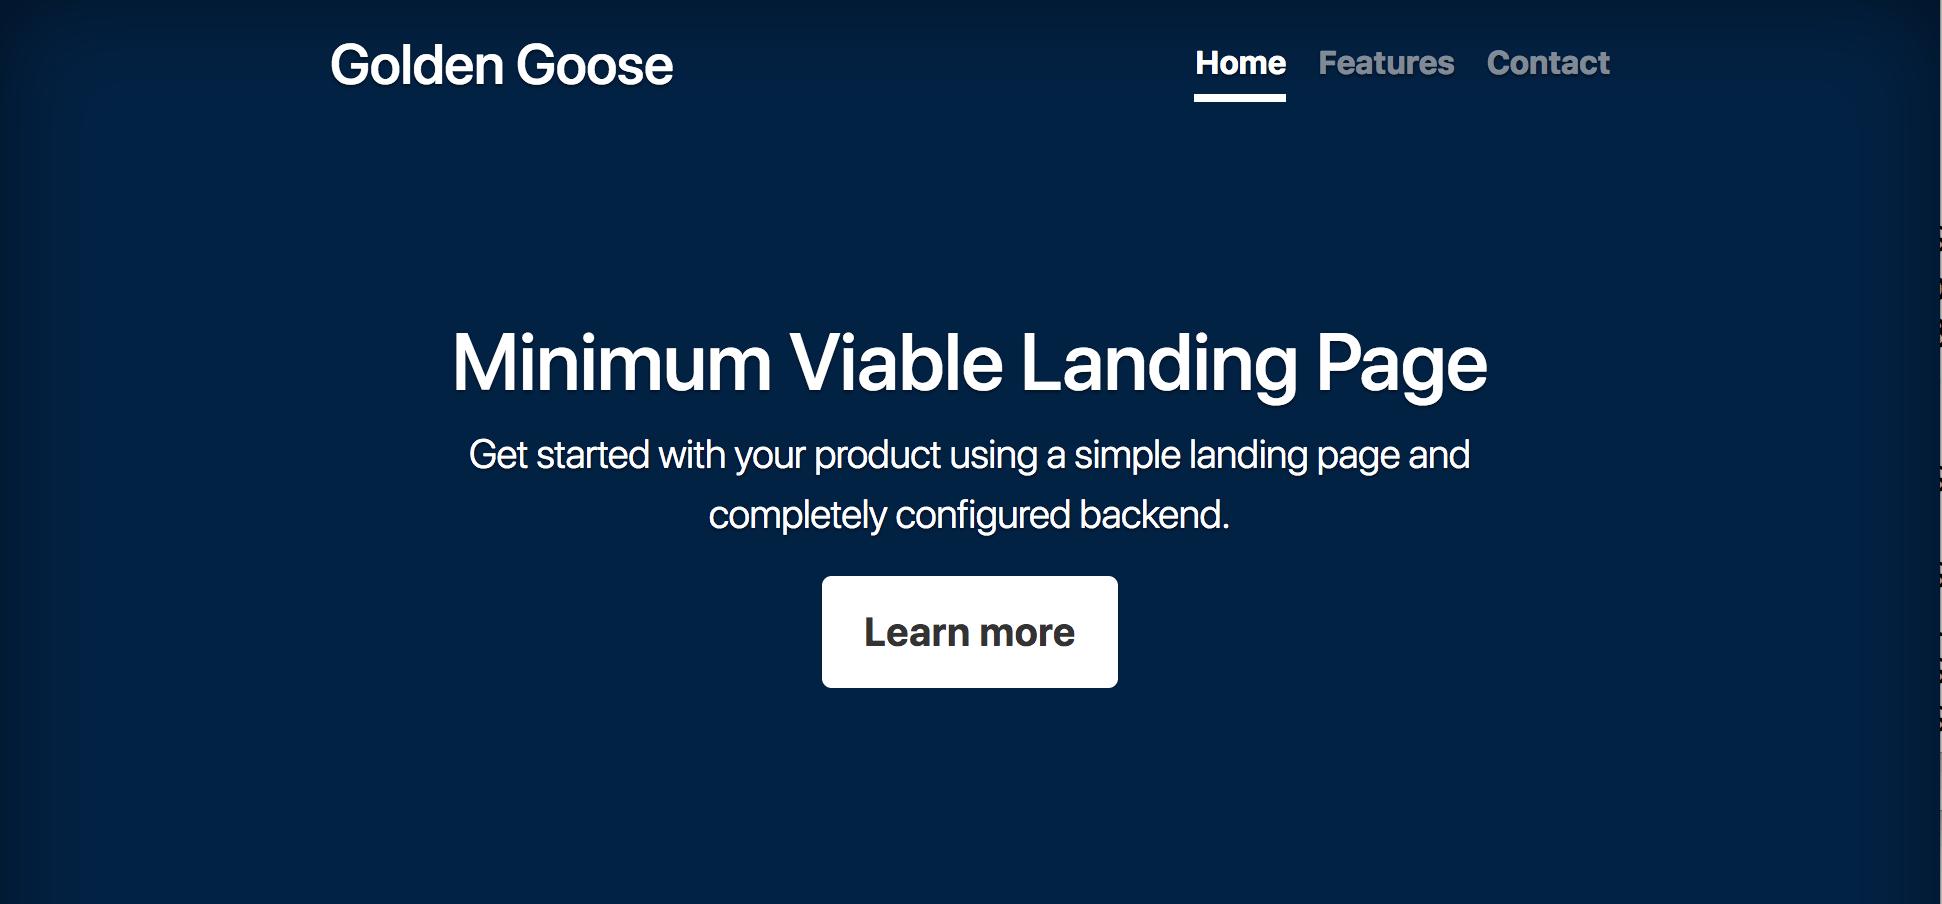 Minimum Viable Landing Page